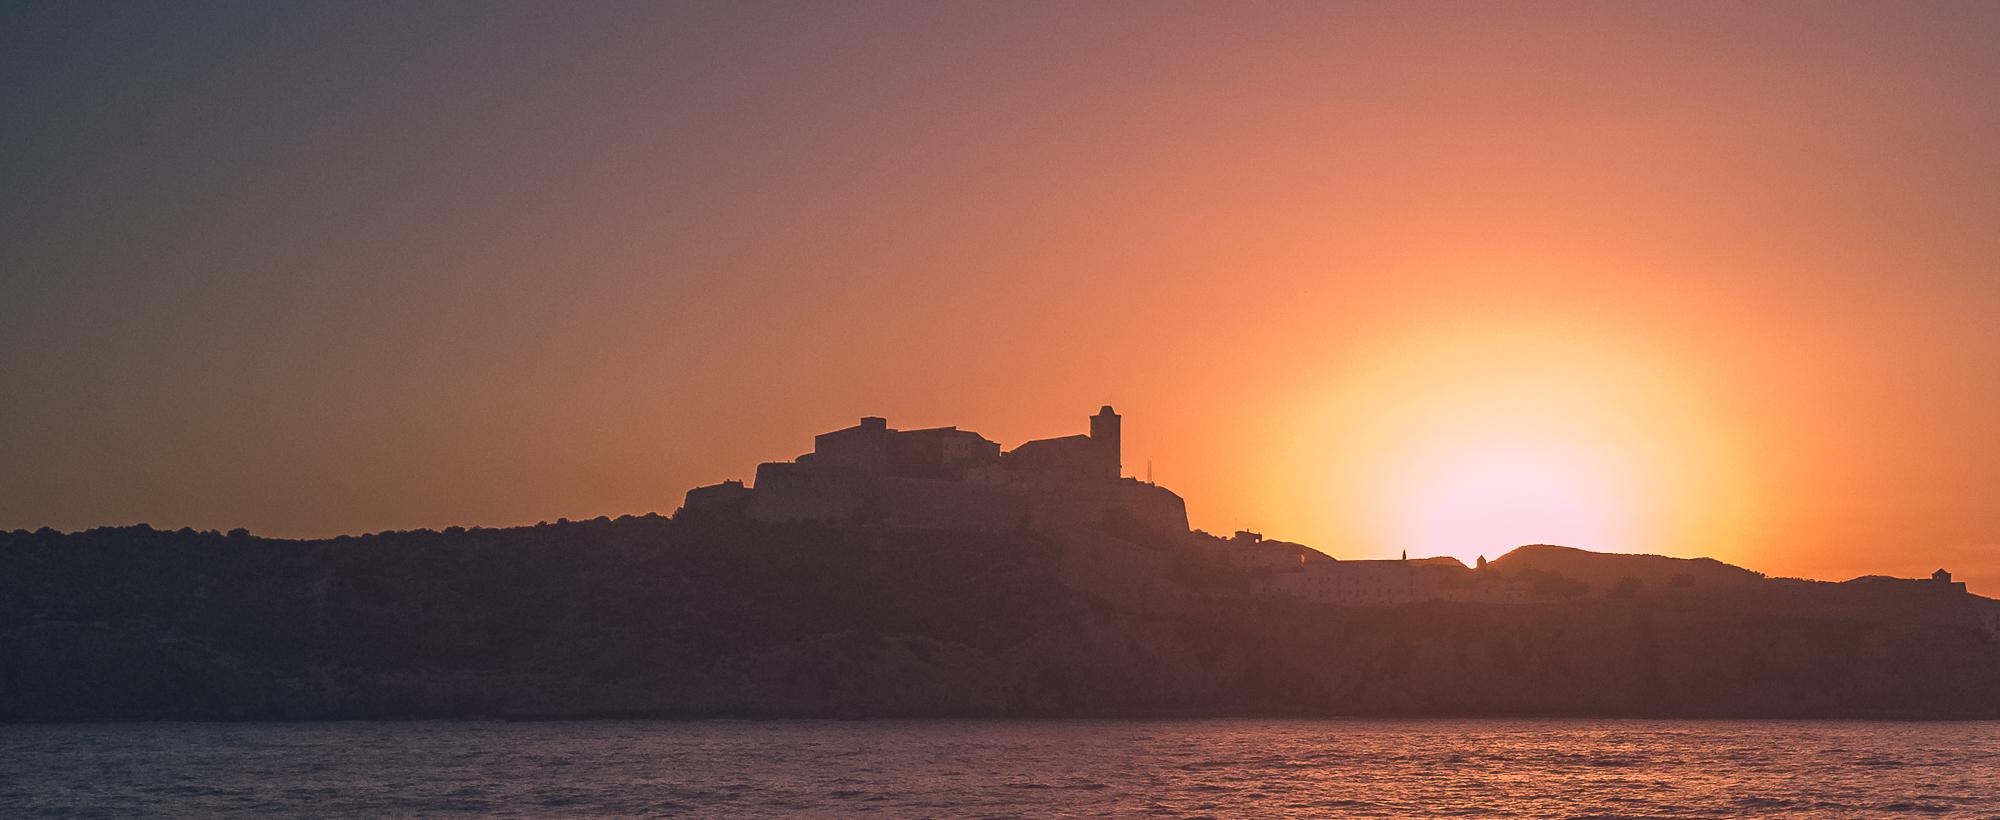 Atardecer en Ibiza. Fotografía móvil